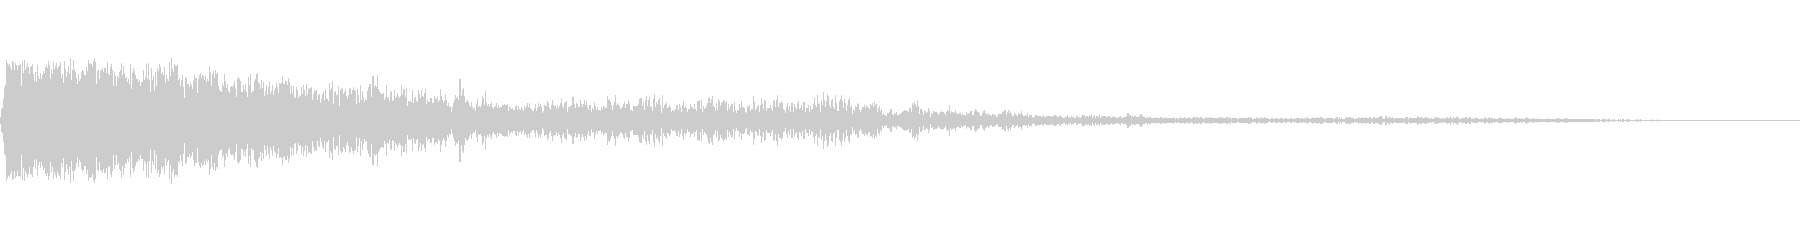 HOWITZER、M101、105...の未再生の波形